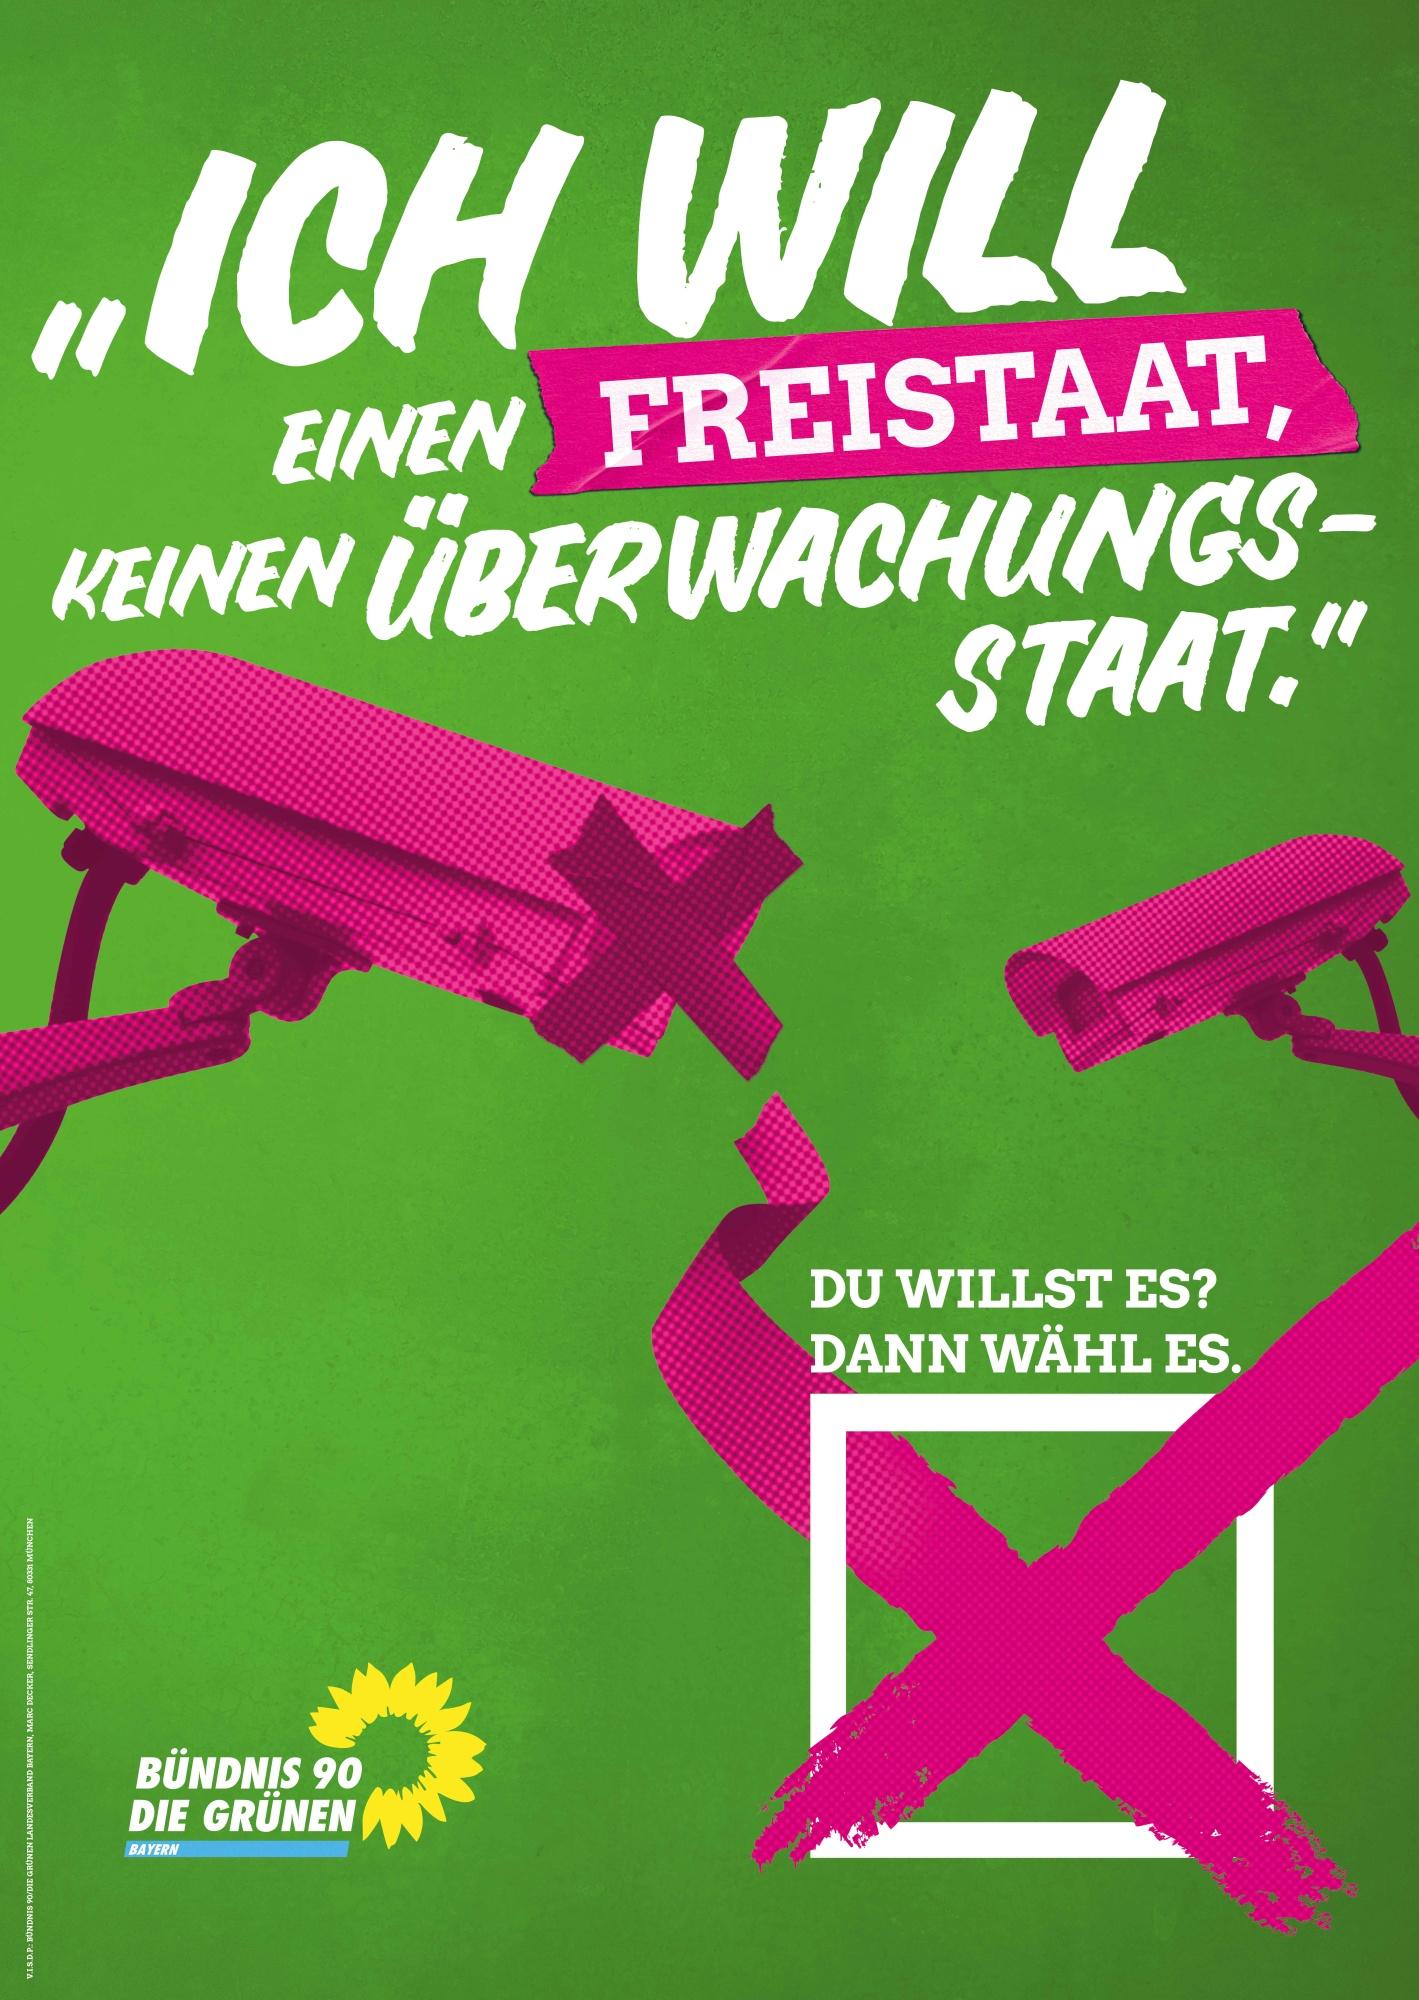 Grüne_Landtagswahl2018_Freistaat.jpg